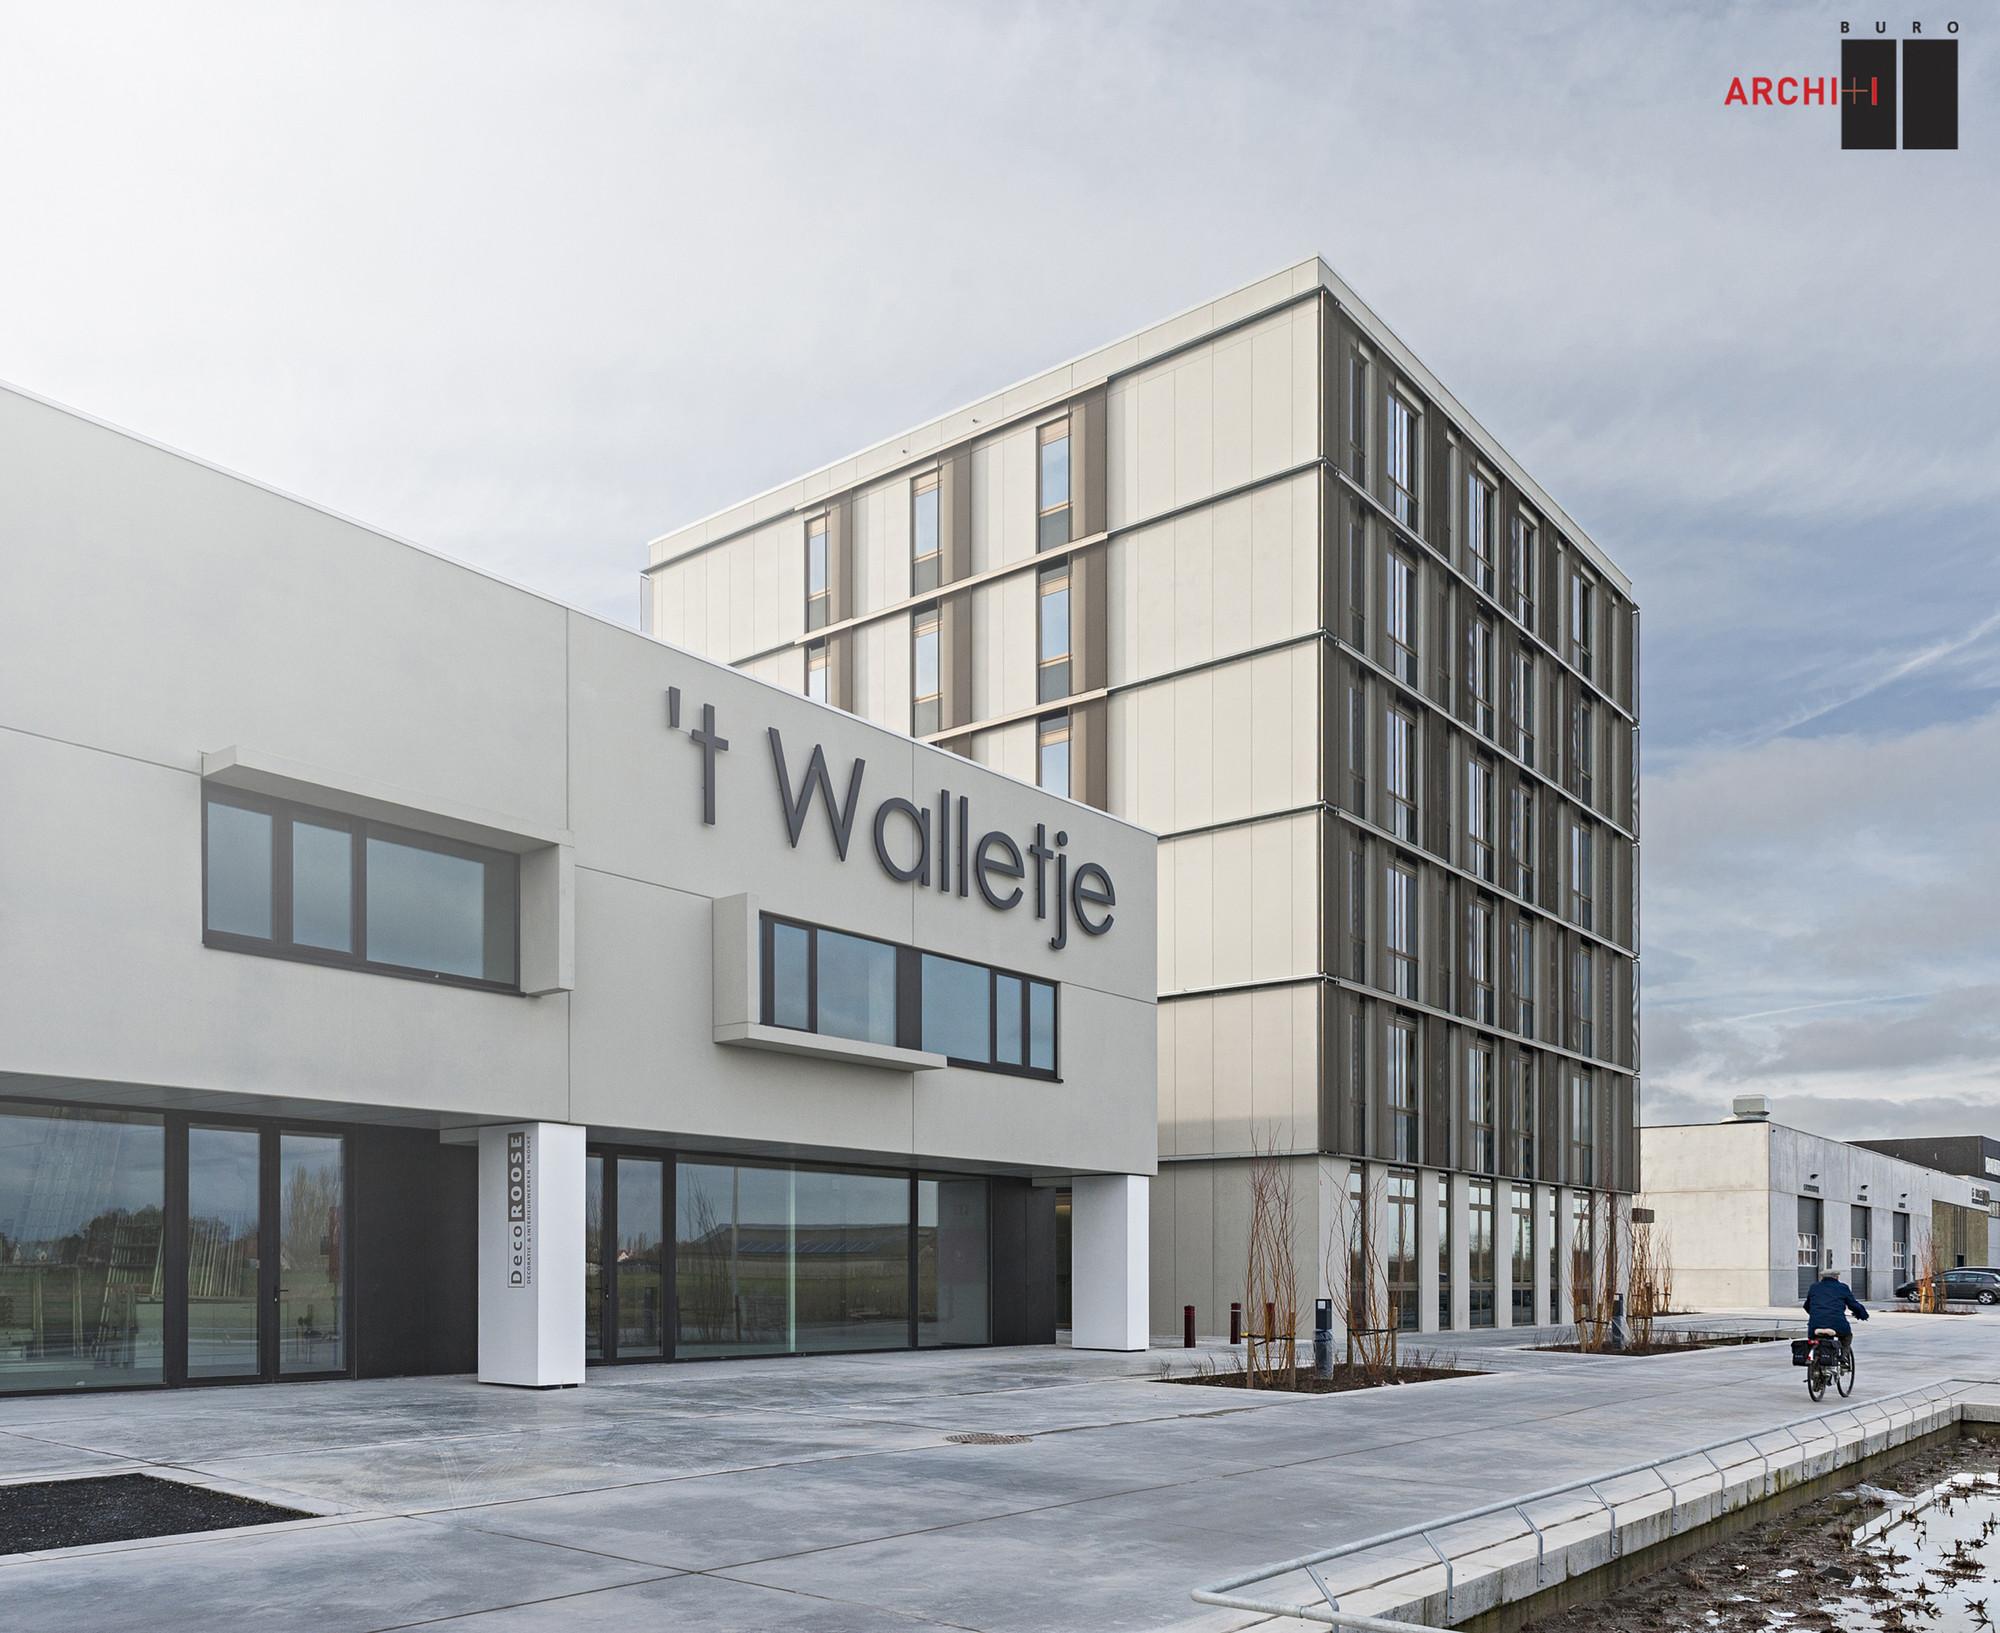 Gallery of business complex building t walletje knokke heist